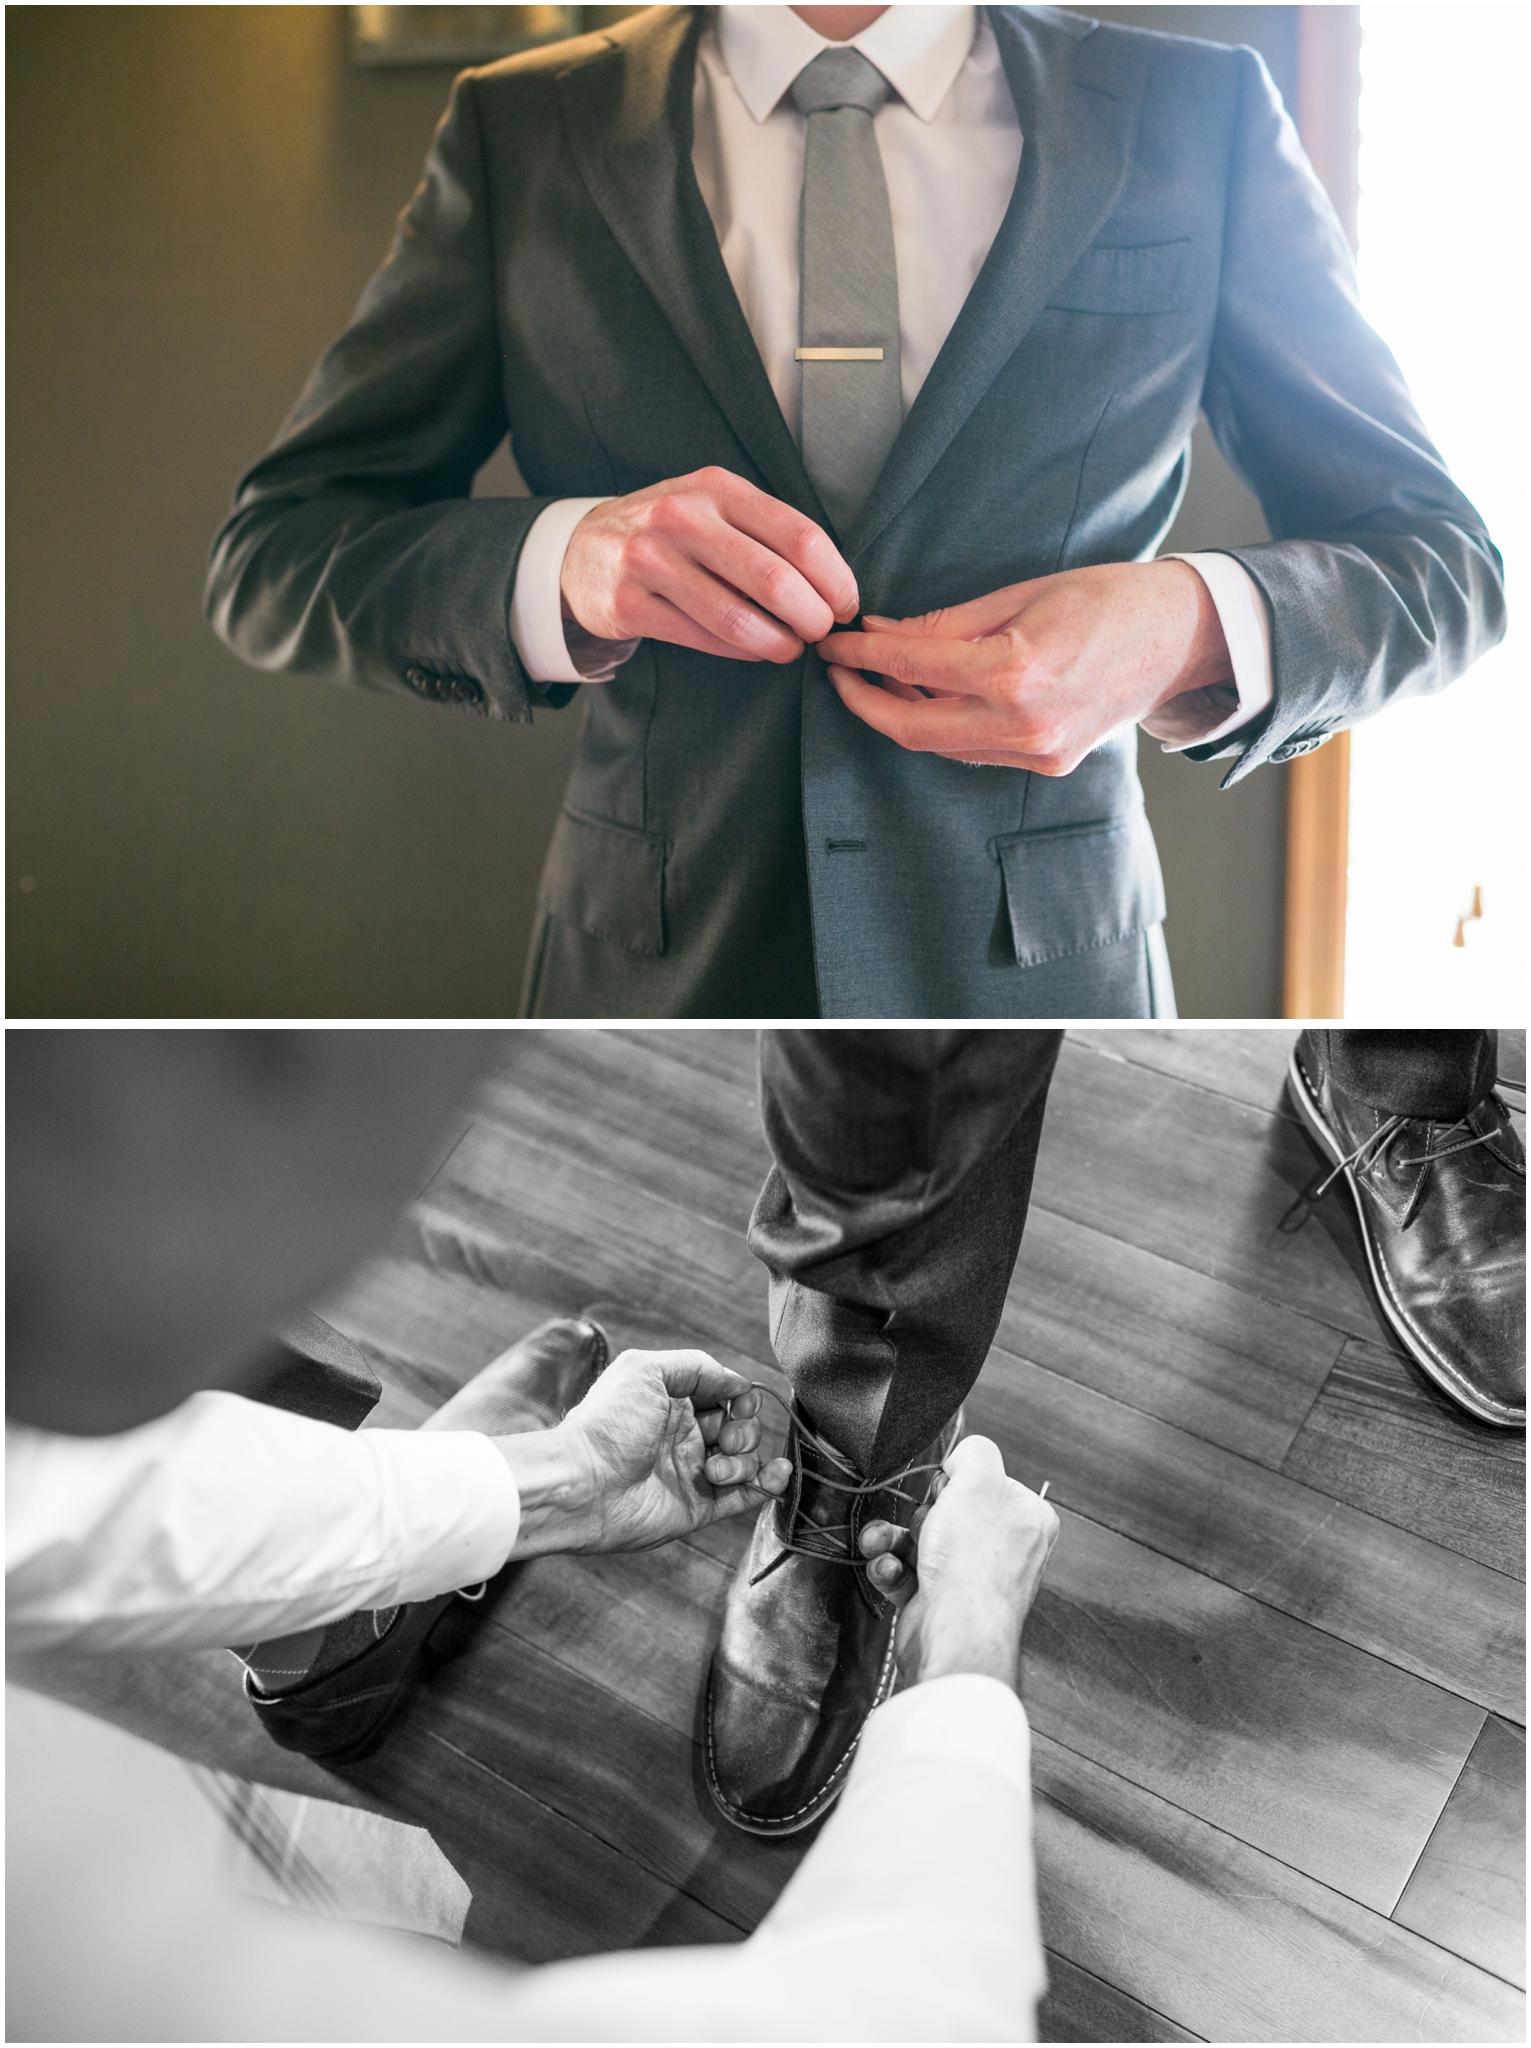 Denver_Wedding_Photographer_Groom_Putting_On _Suit.JPG